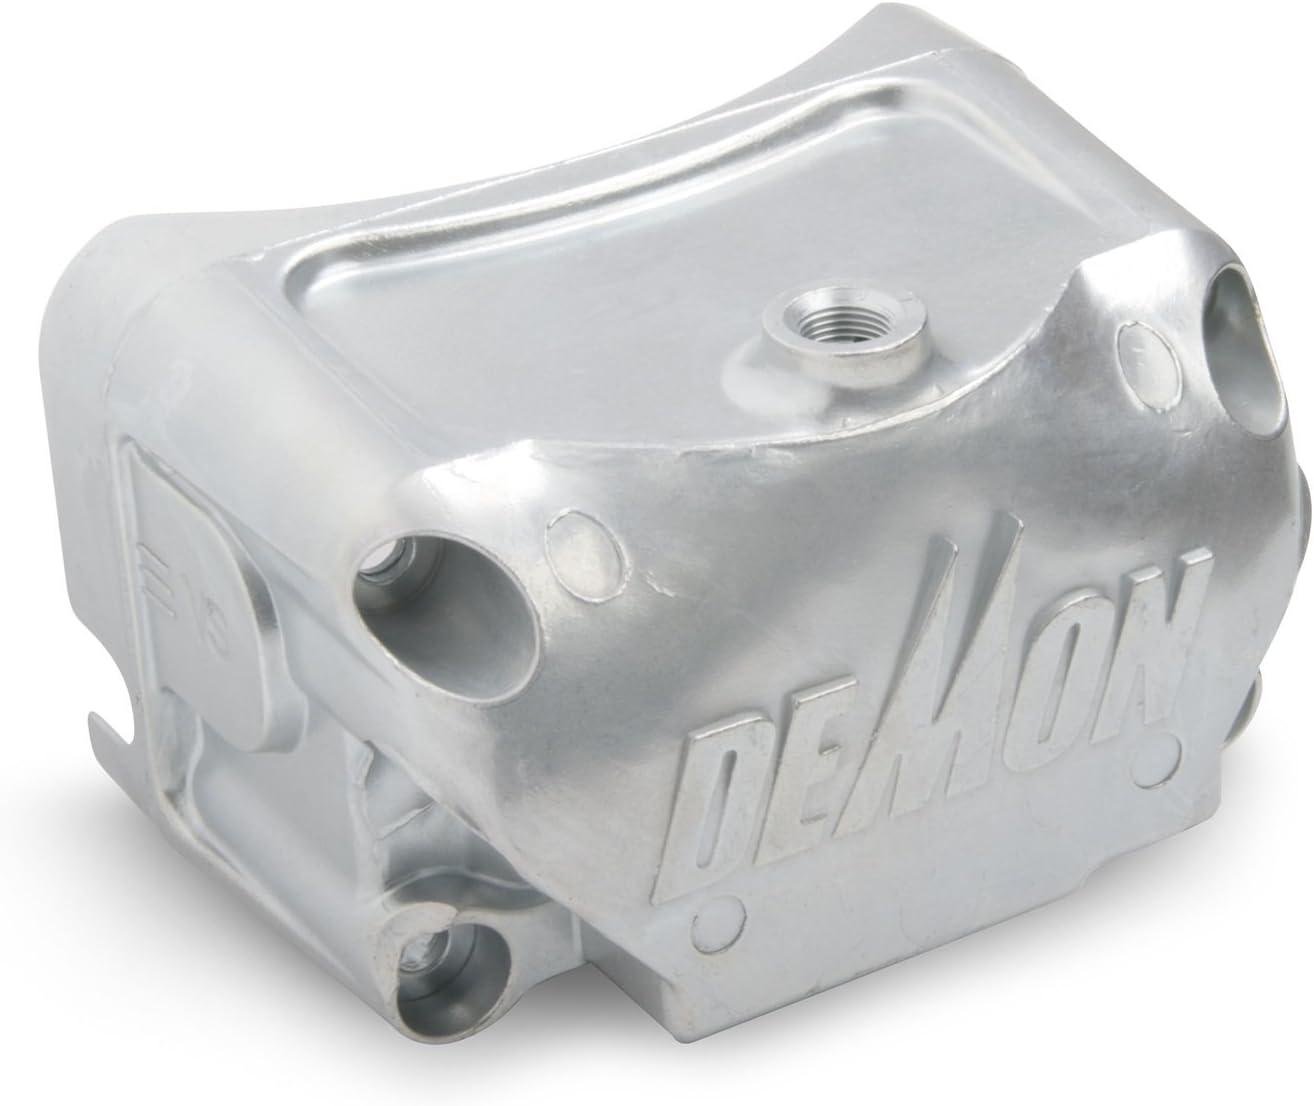 Directly Manufacturer OFFicial shop managed store Demon 421362 Fuel Bowl